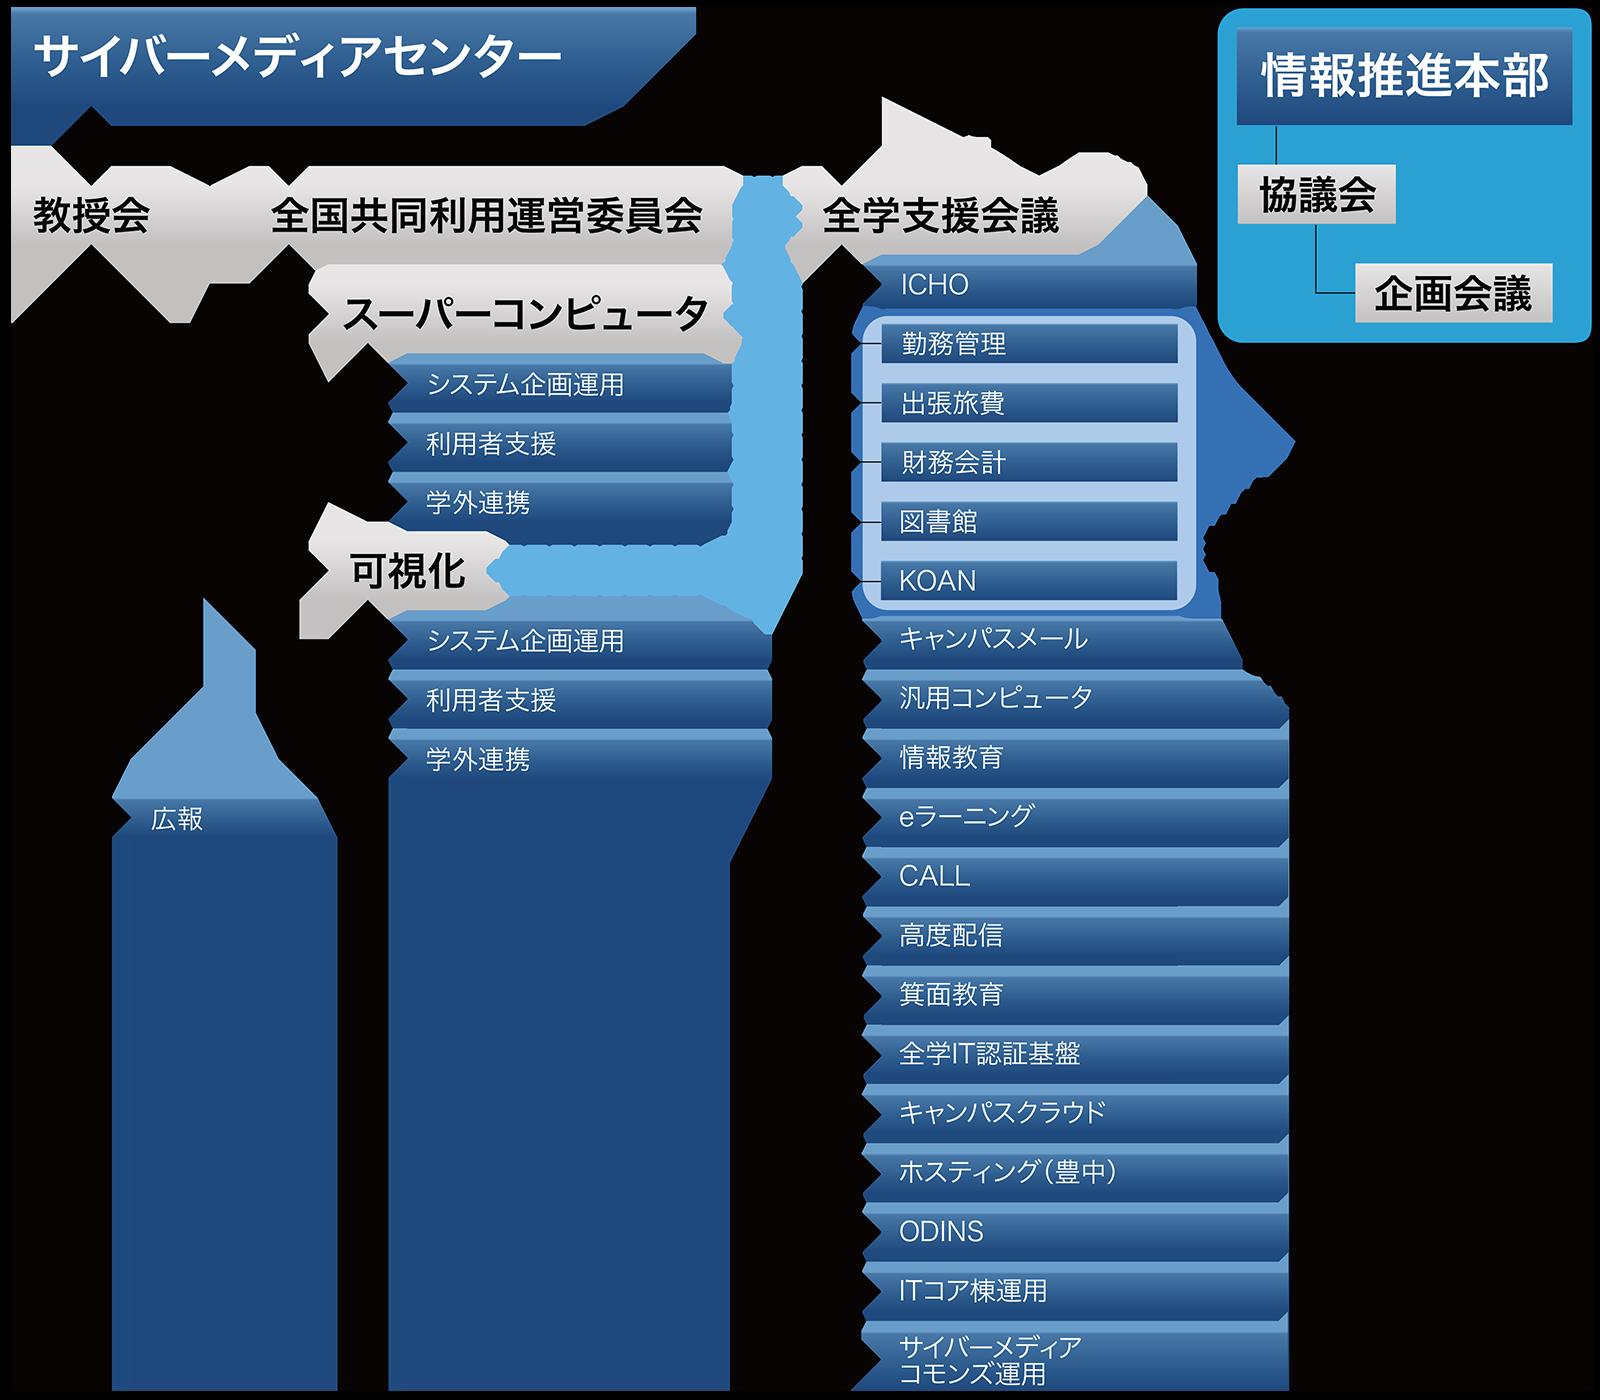 UWS_system_H28_w1600